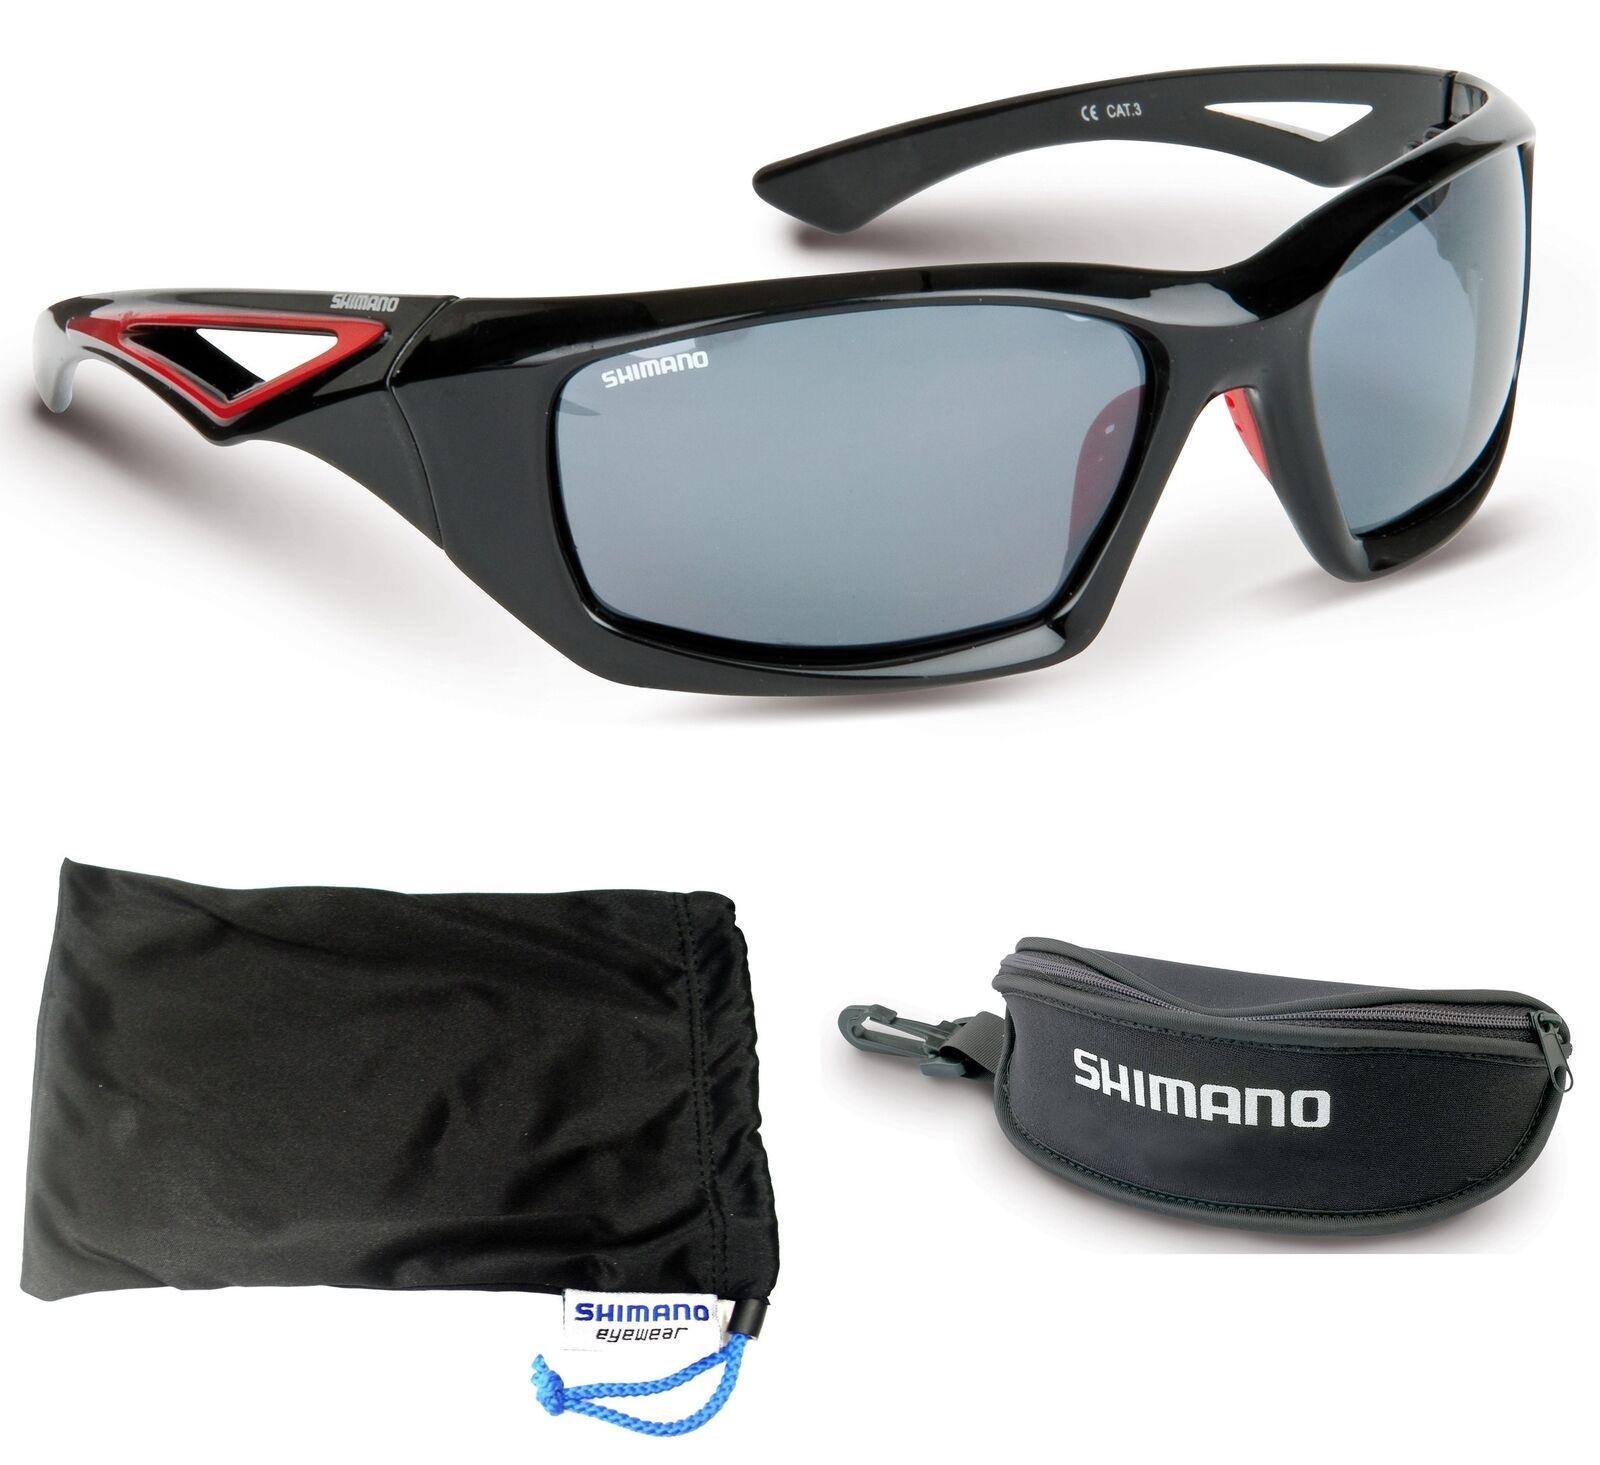 Shimano Sunglasses Aernos polarised, SUNAERNOS